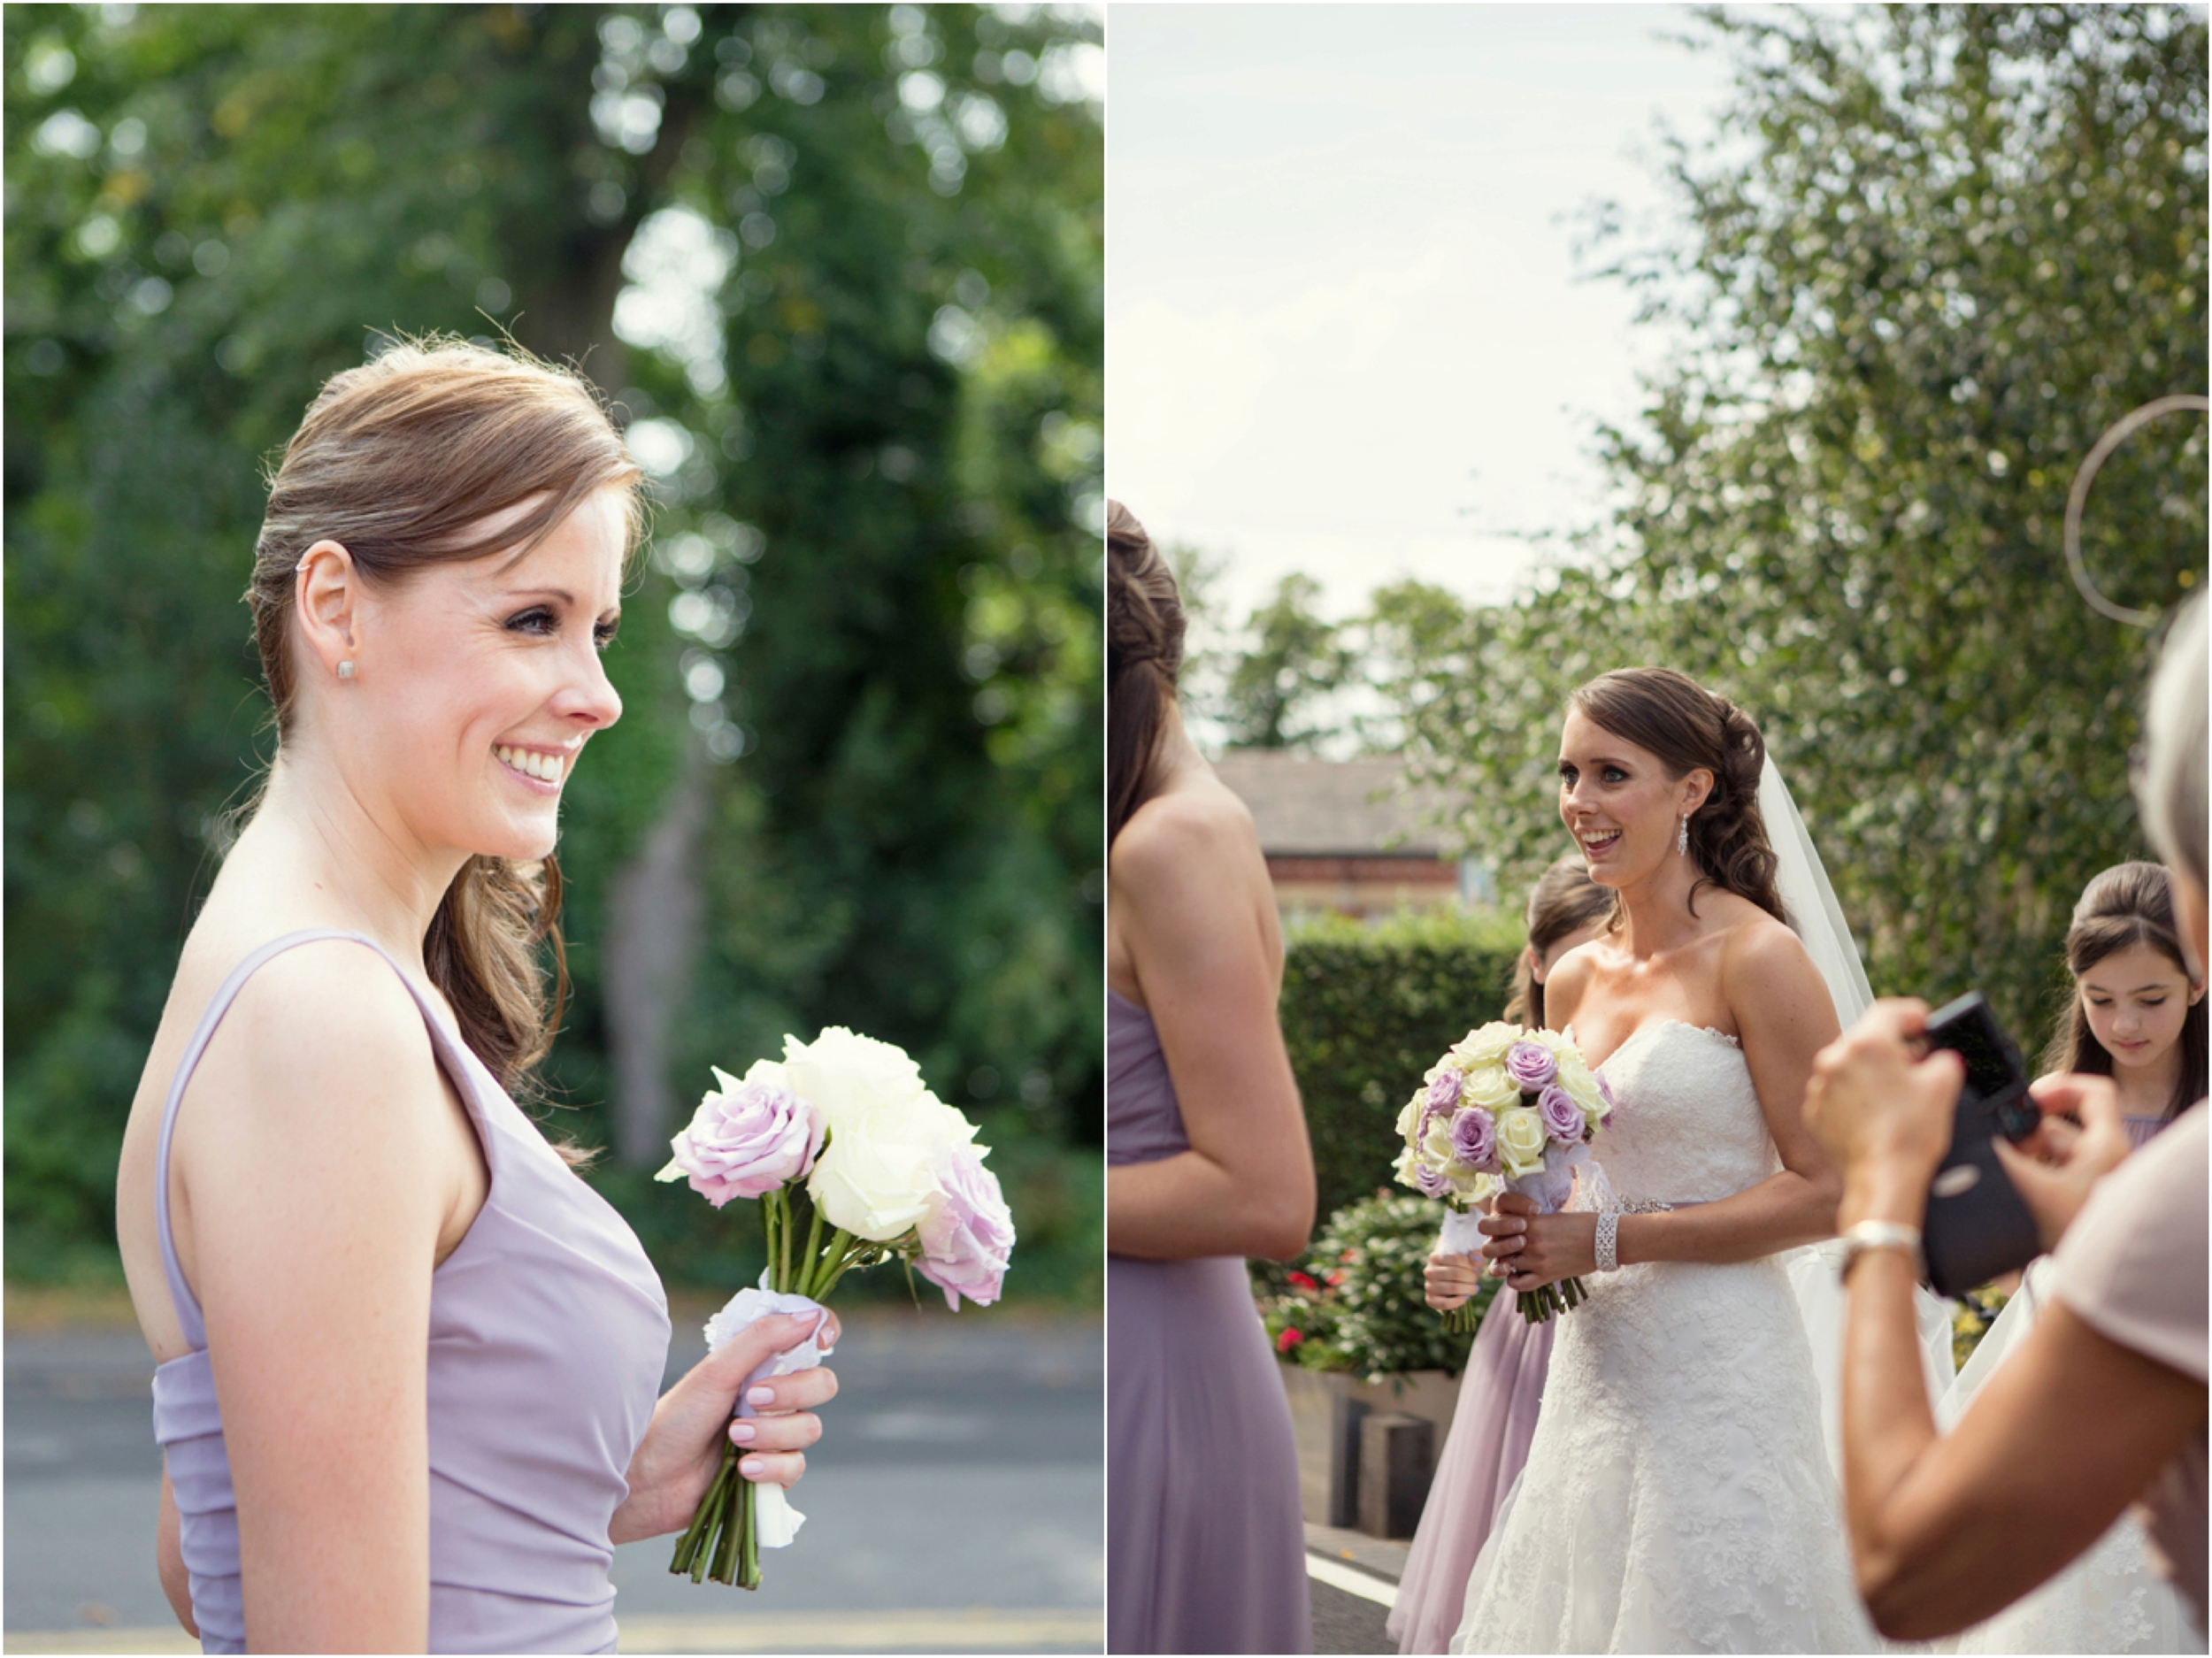 Sophie Evans Photography, Warwickshire Wedding Photography, Welcombe Hotel  (20).jpg